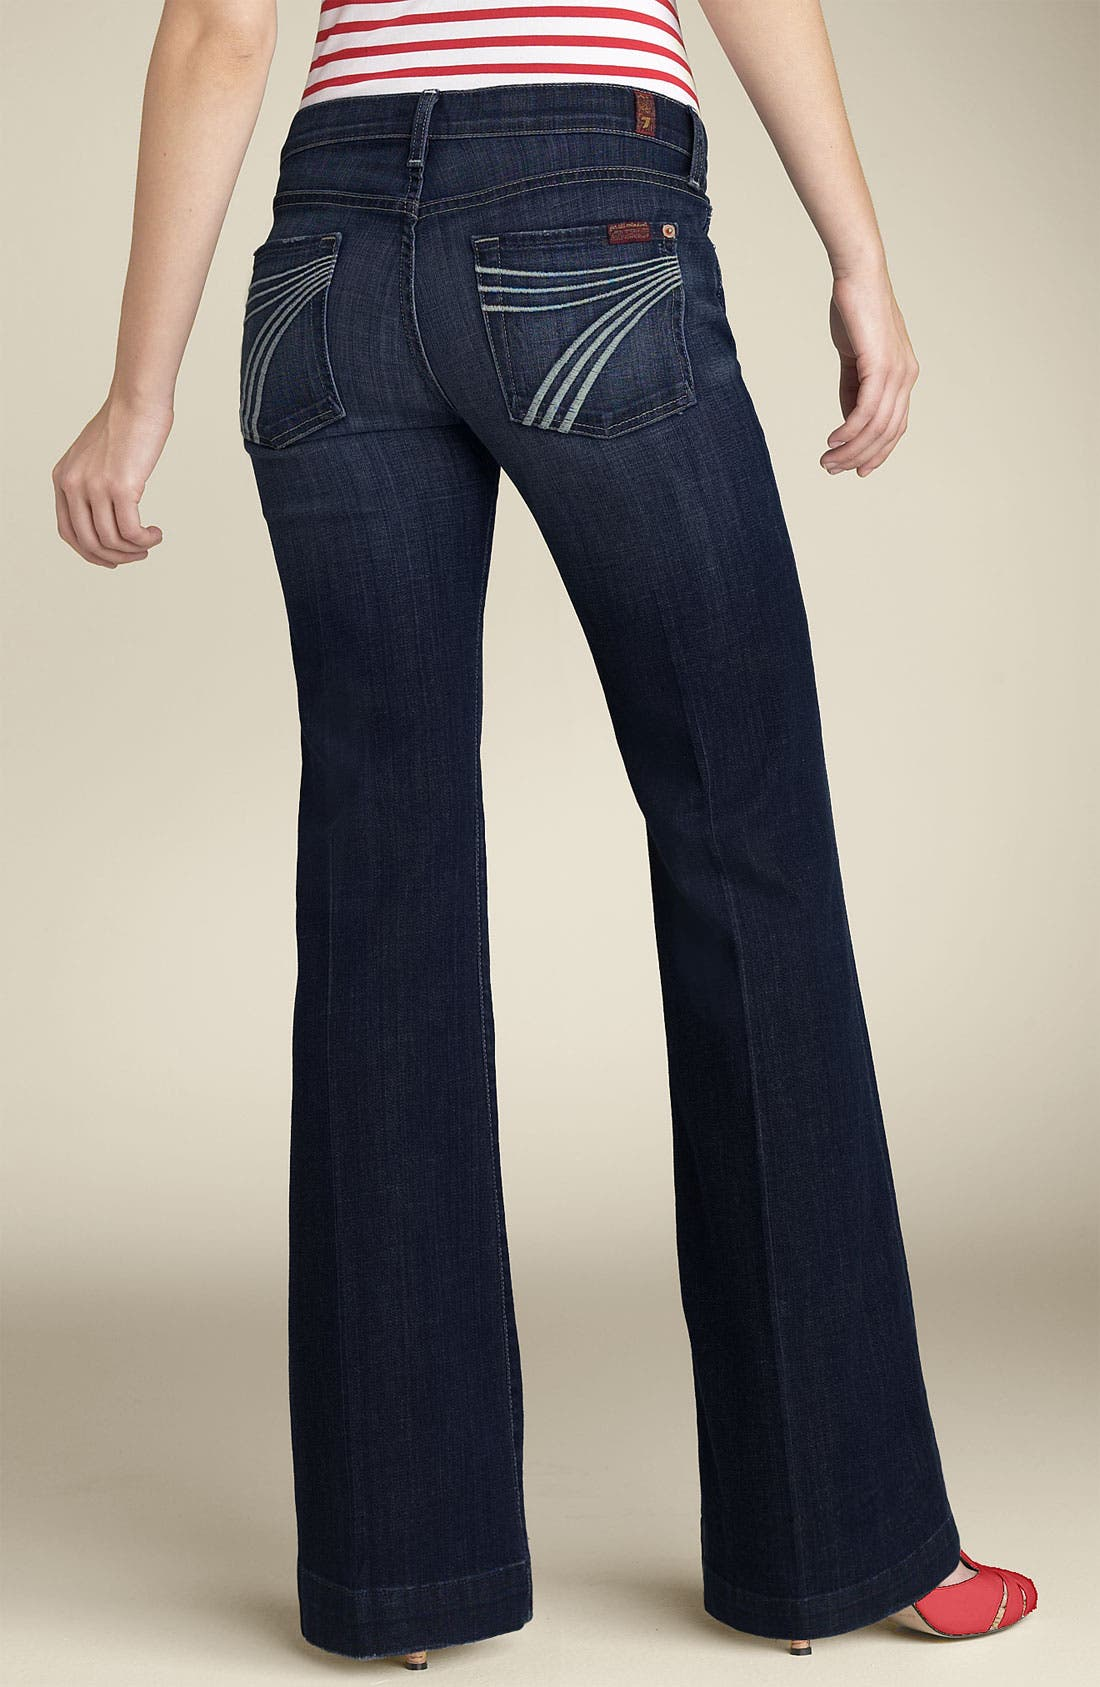 'Dojo' Stretch Trouser Jeans, Main, color, 499